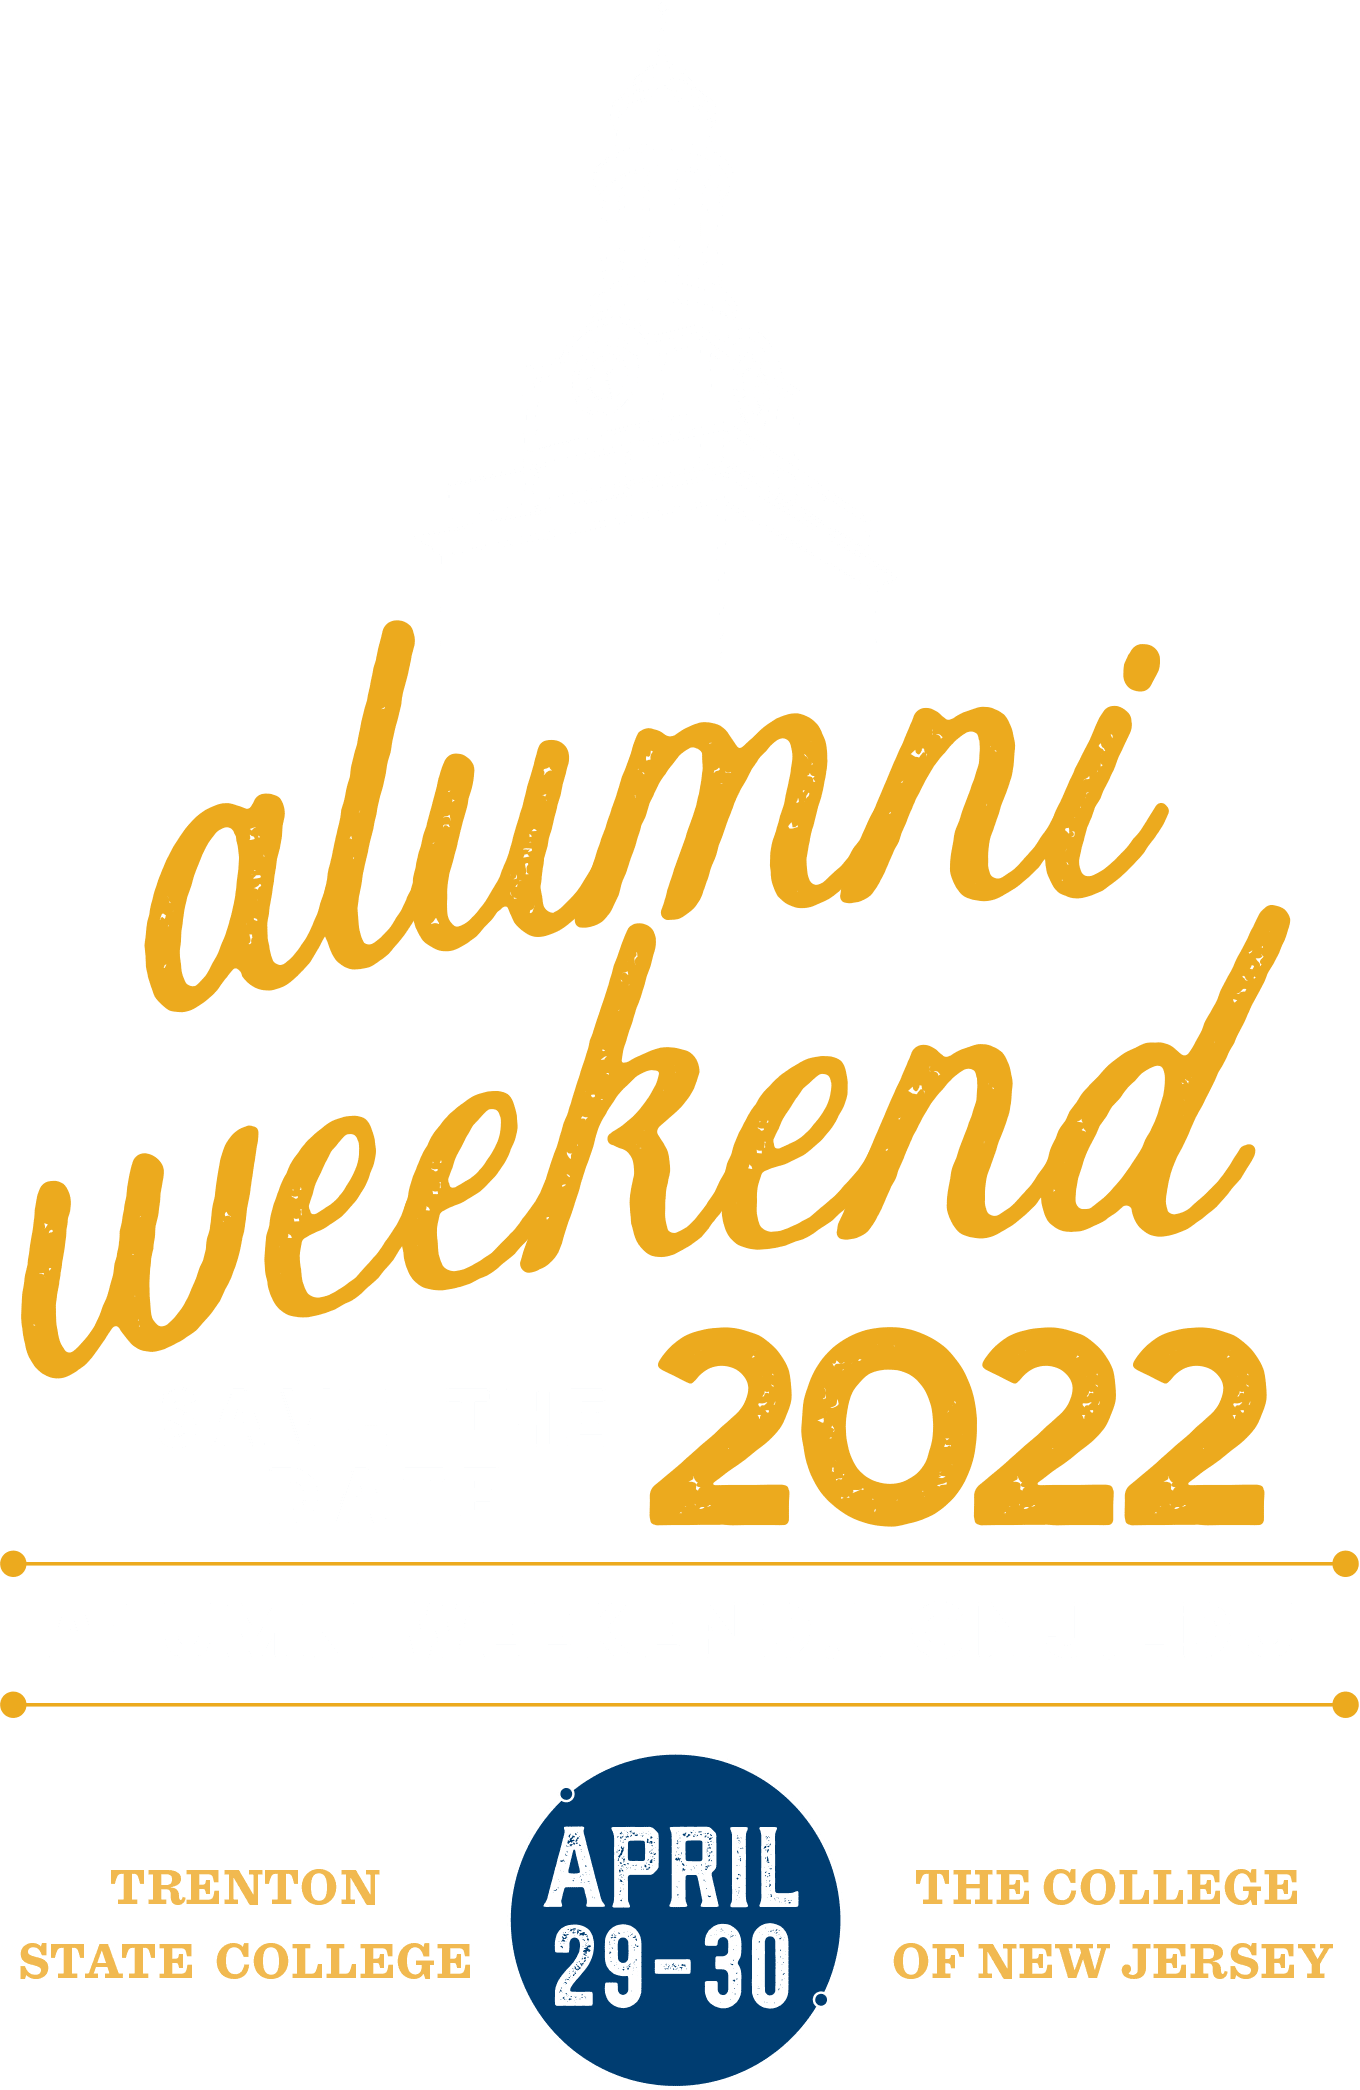 alumni weekend logo